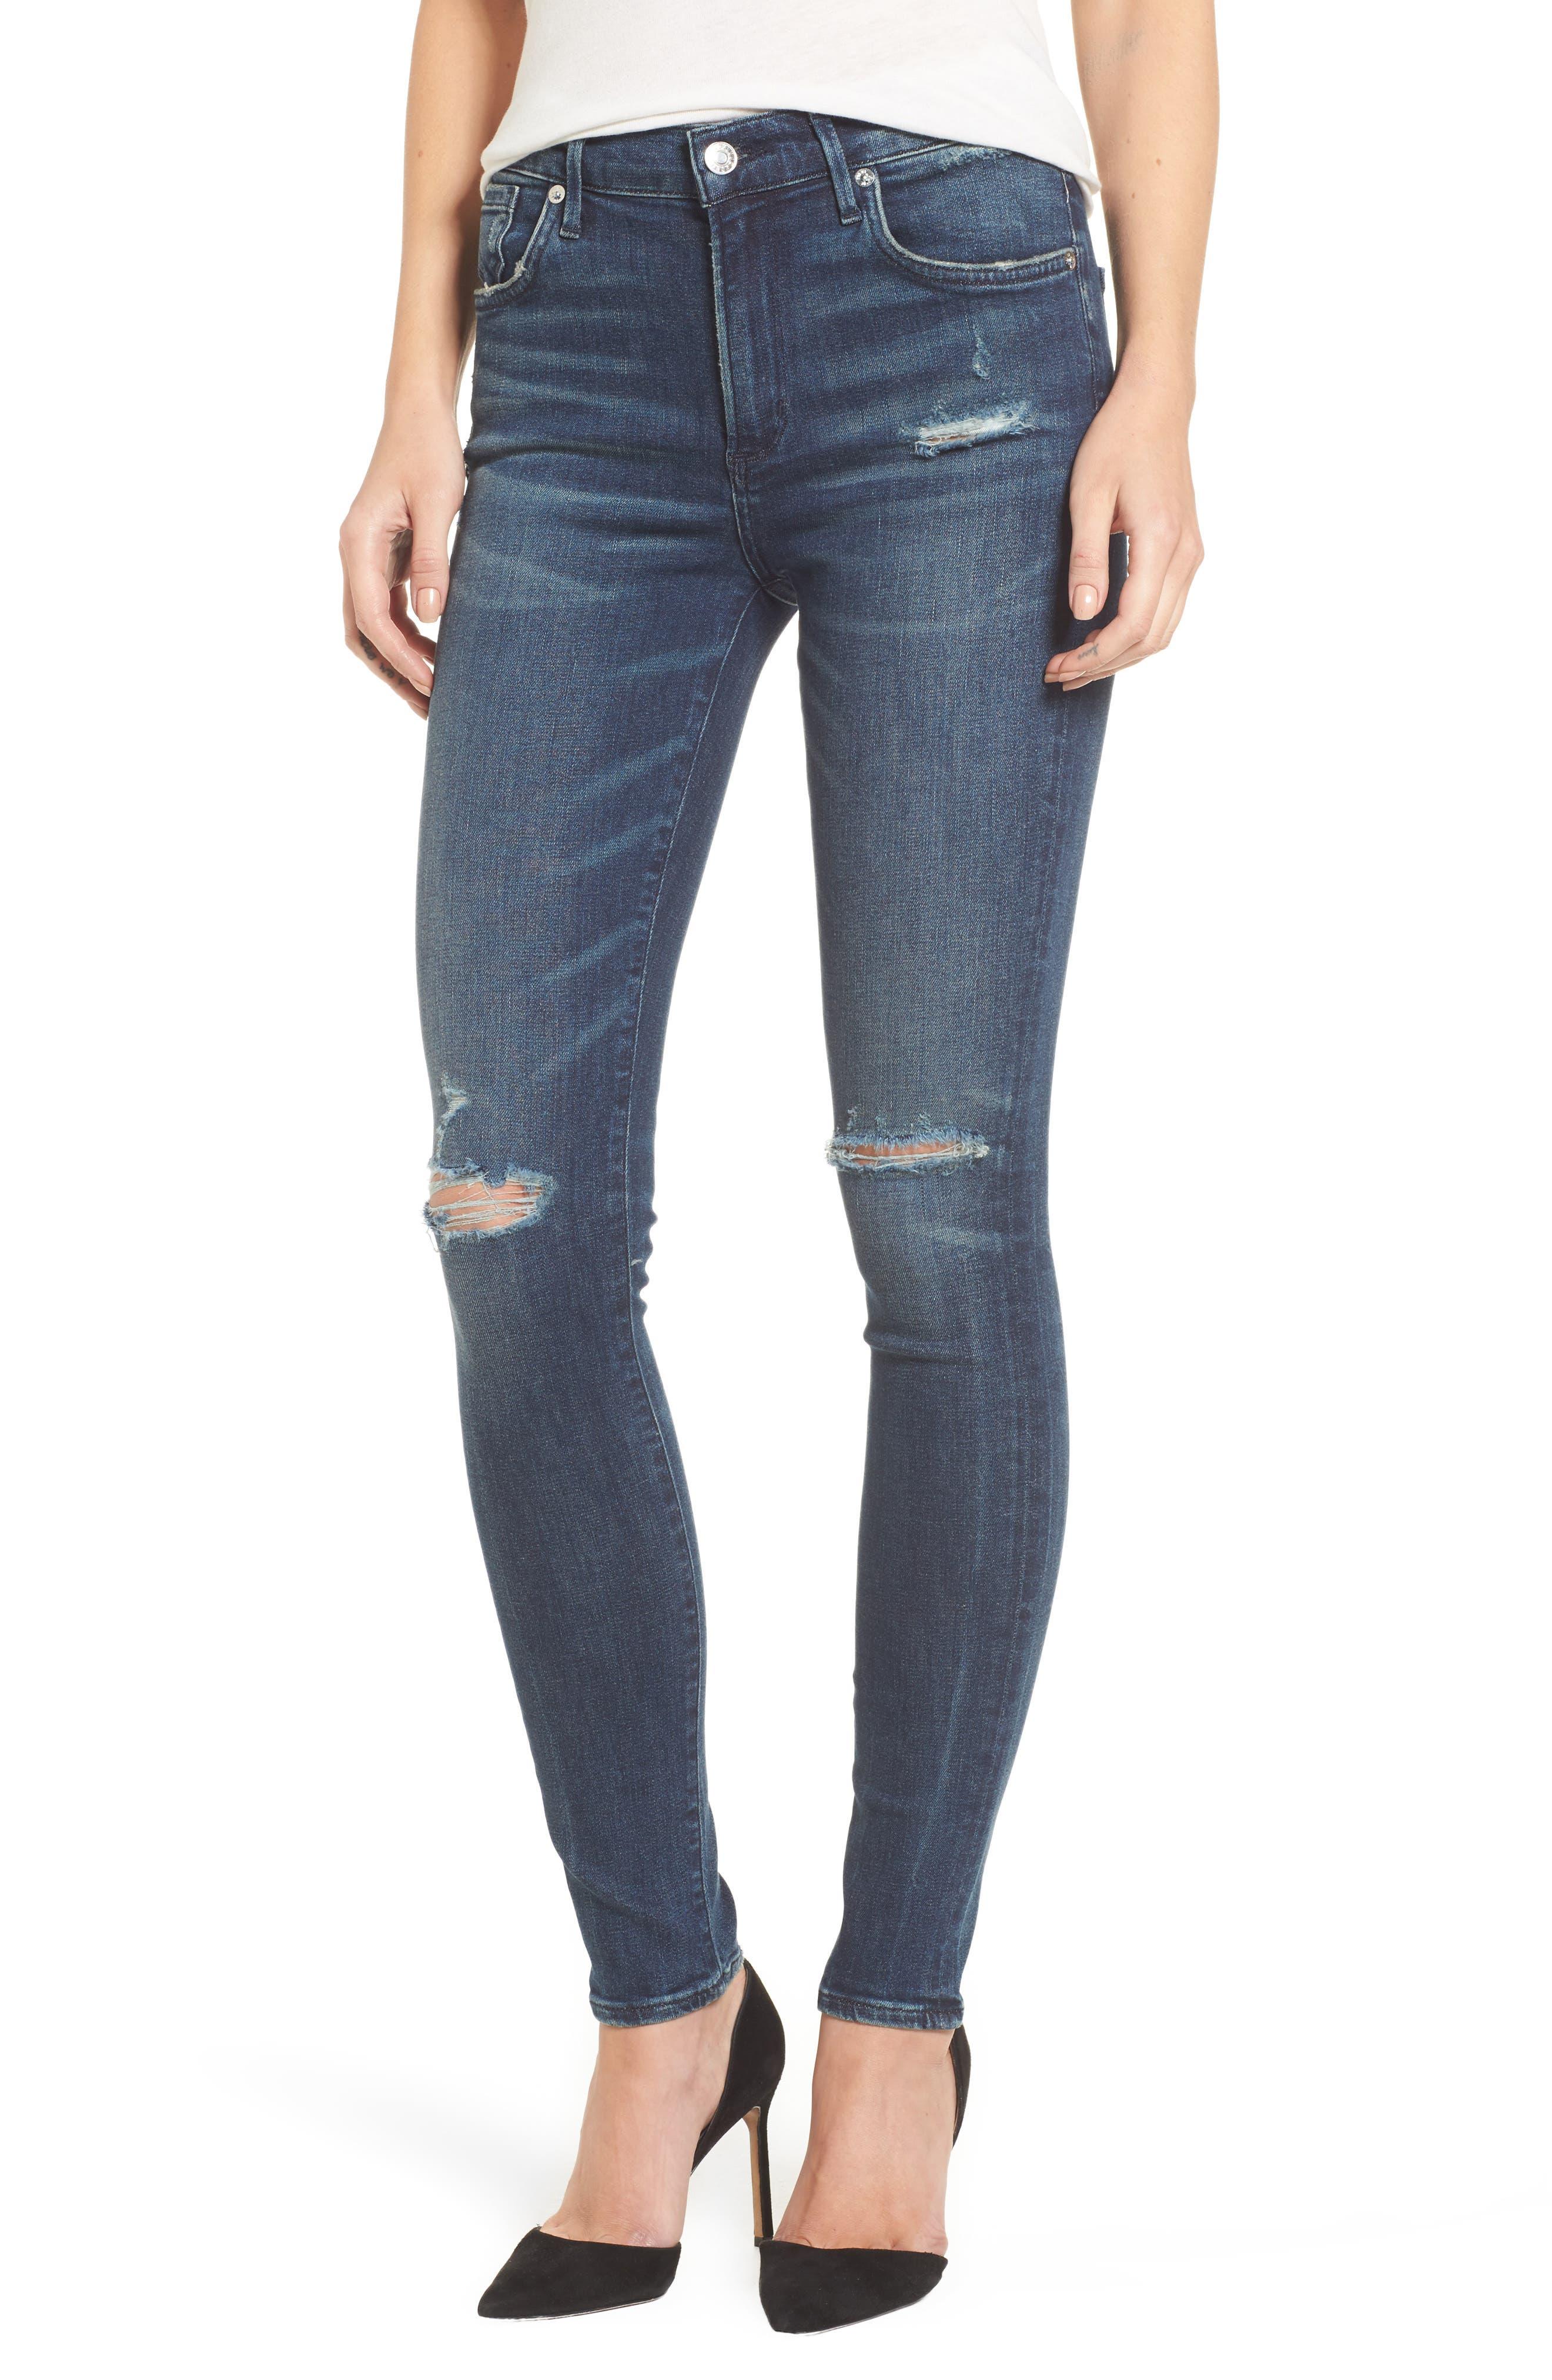 Alternate Image 1 Selected - AGOLDE Sophie High Waist Skinny Jeans